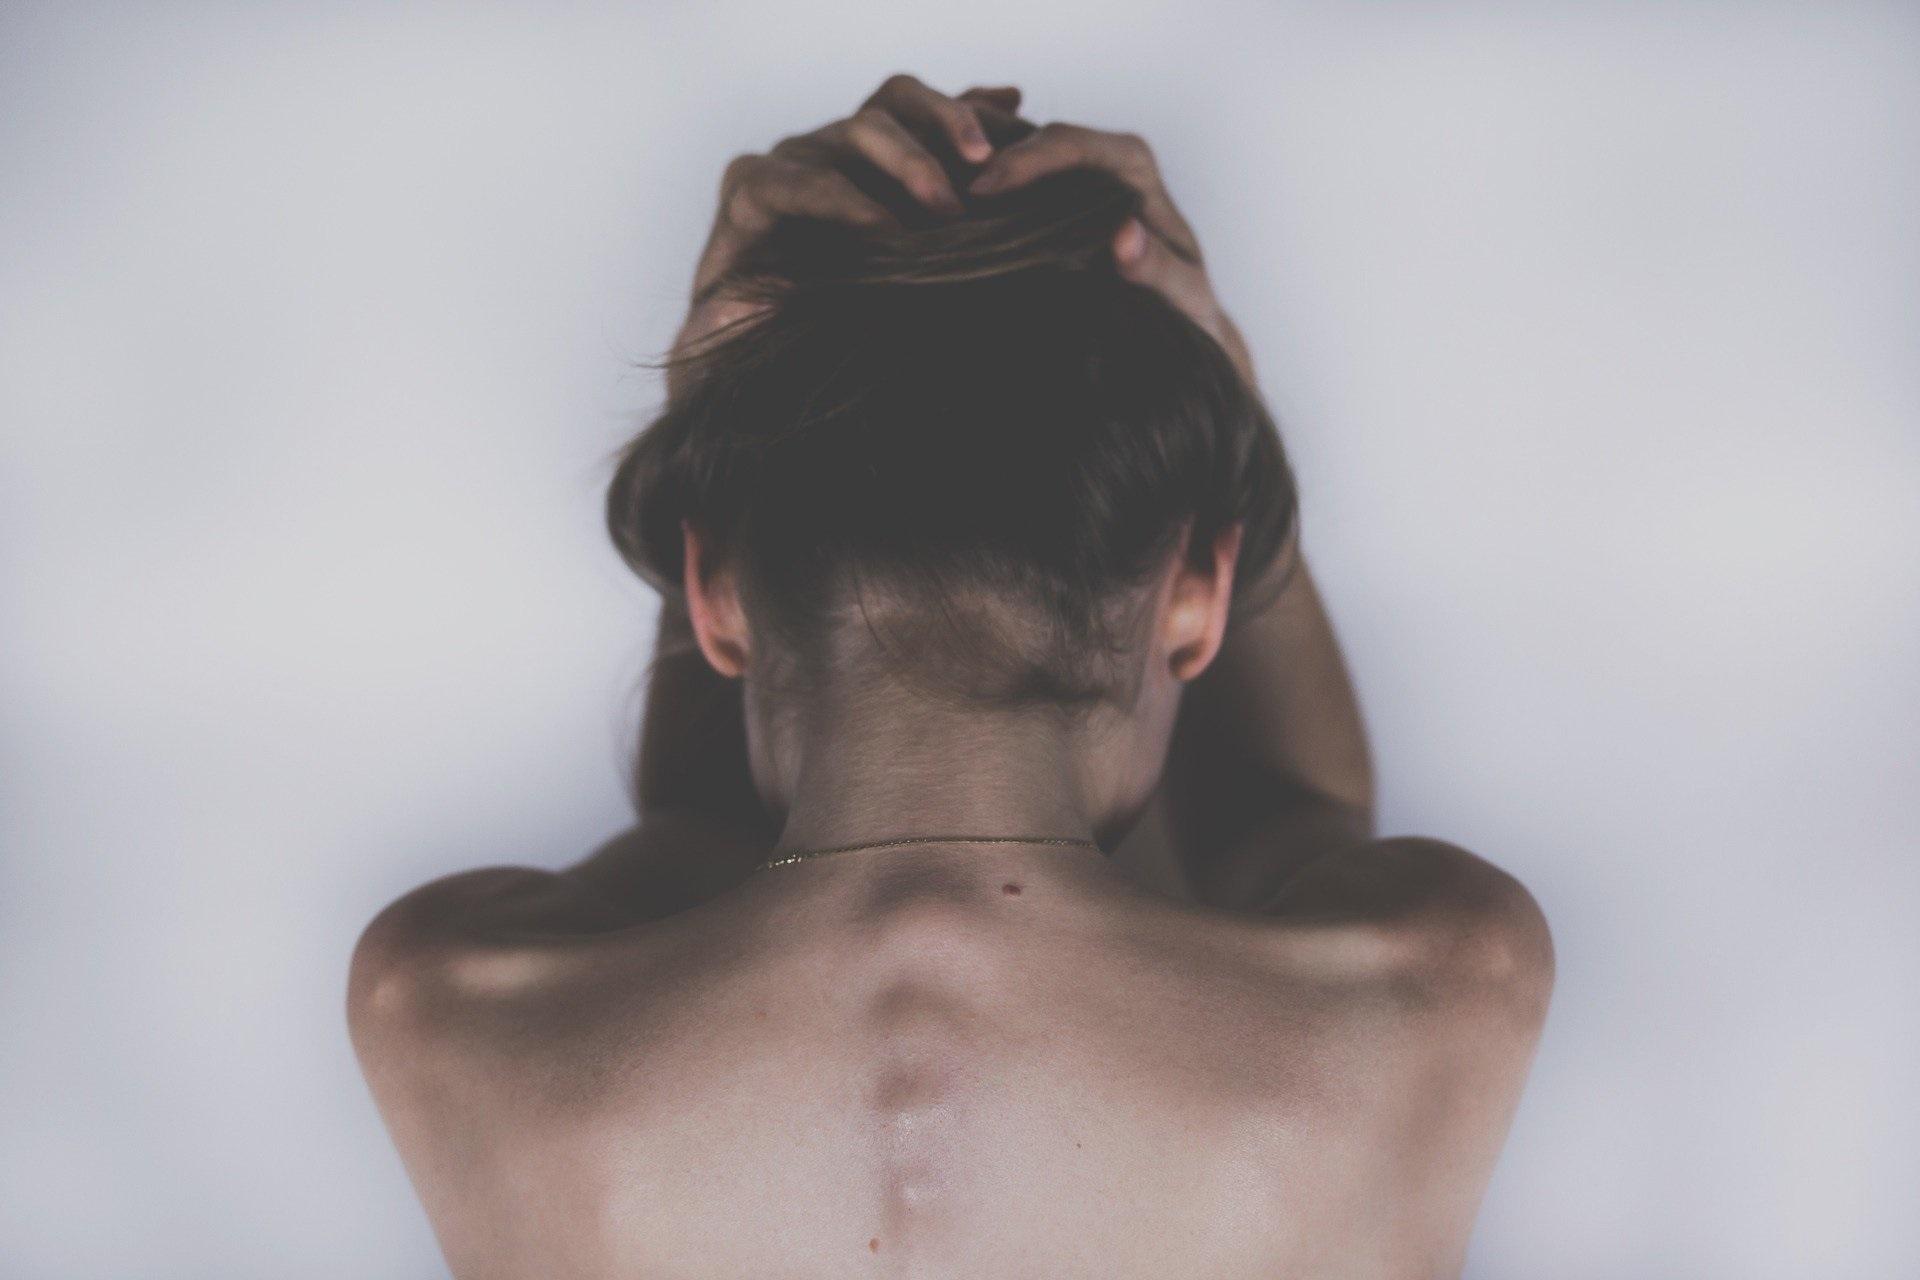 Ho la Fibromialgia?